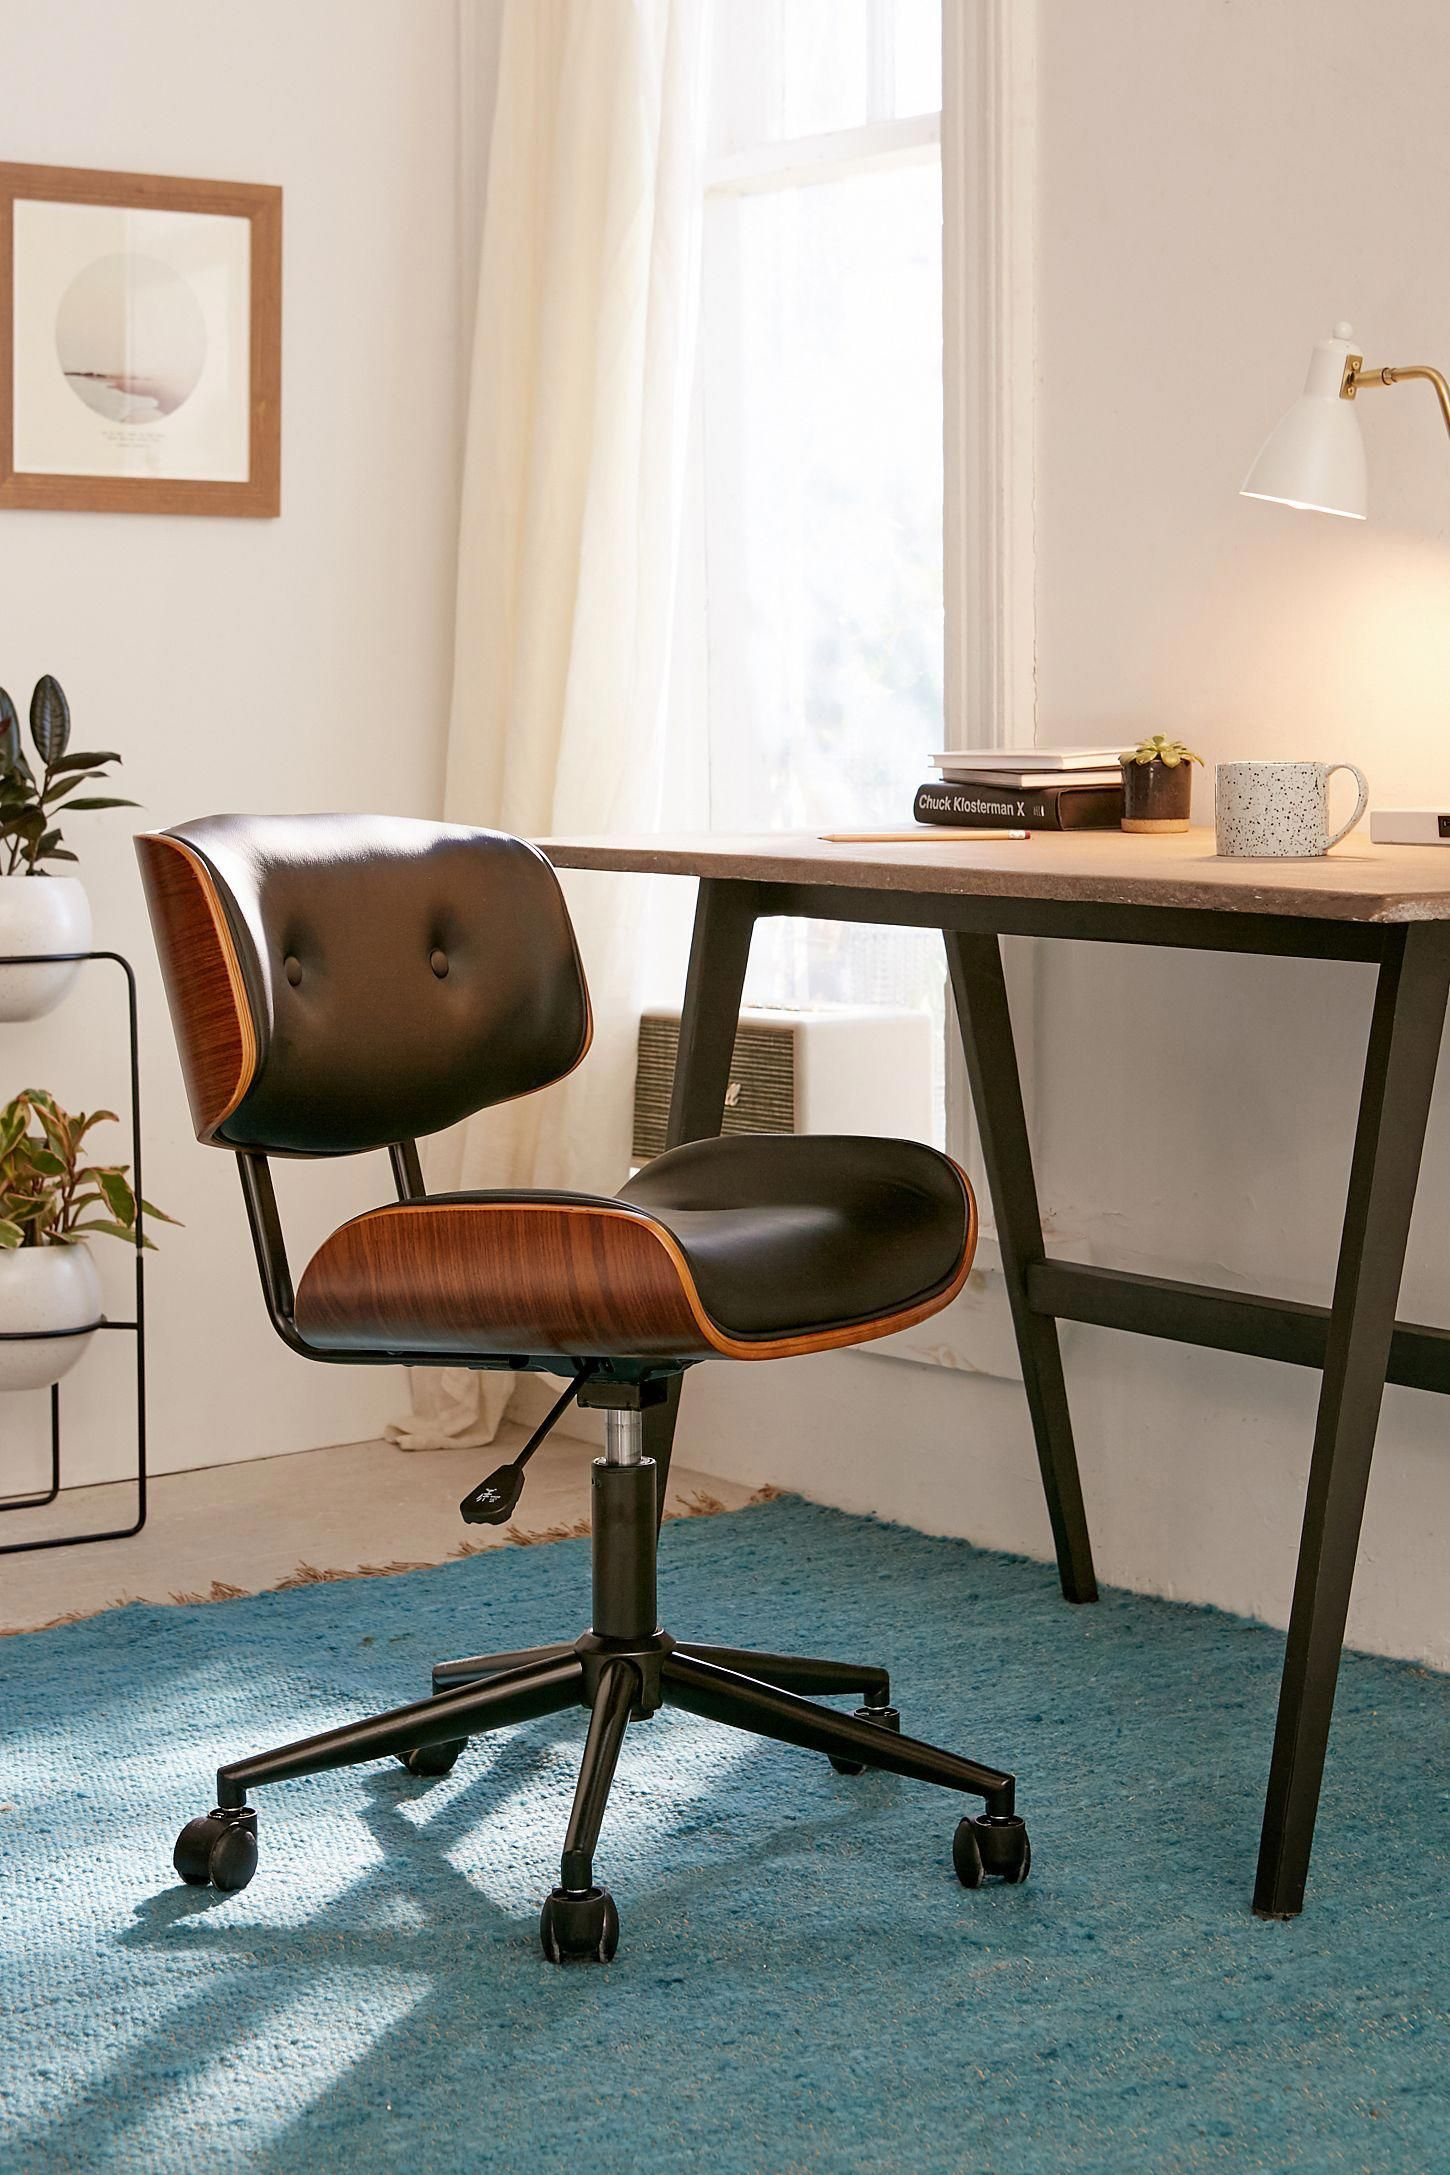 Lombardi Adjustable Desk Chair Chair Design Desk Chair Comfy Ergonomic Desk Chair